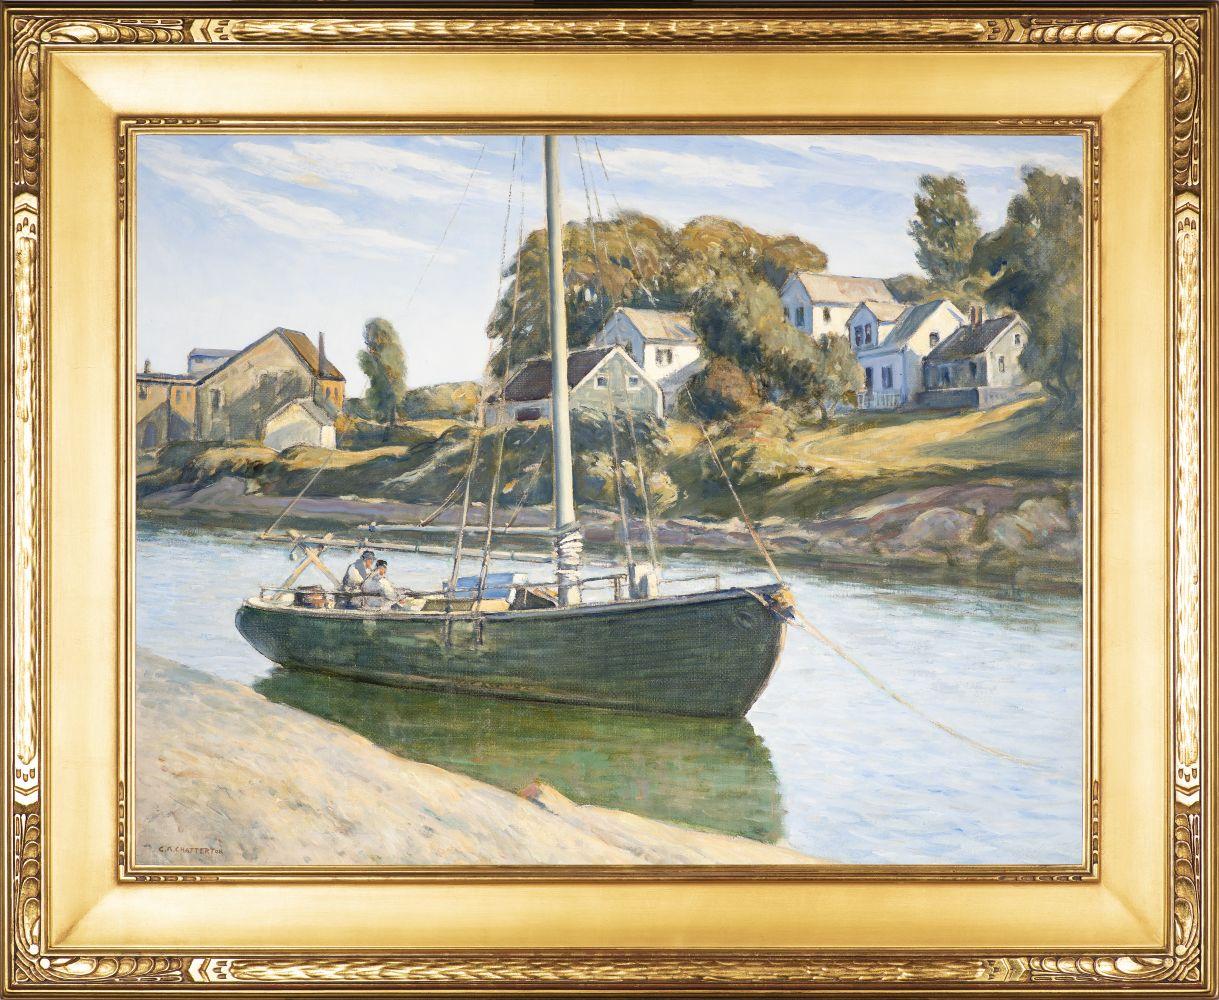 Clarence K. Chatterton (1880–1973), Inlet at Ogunquit, Maine, c. 1925, oil on canvas, 28 x 36 in., signed lower left: C.K. Chatterton (framed)